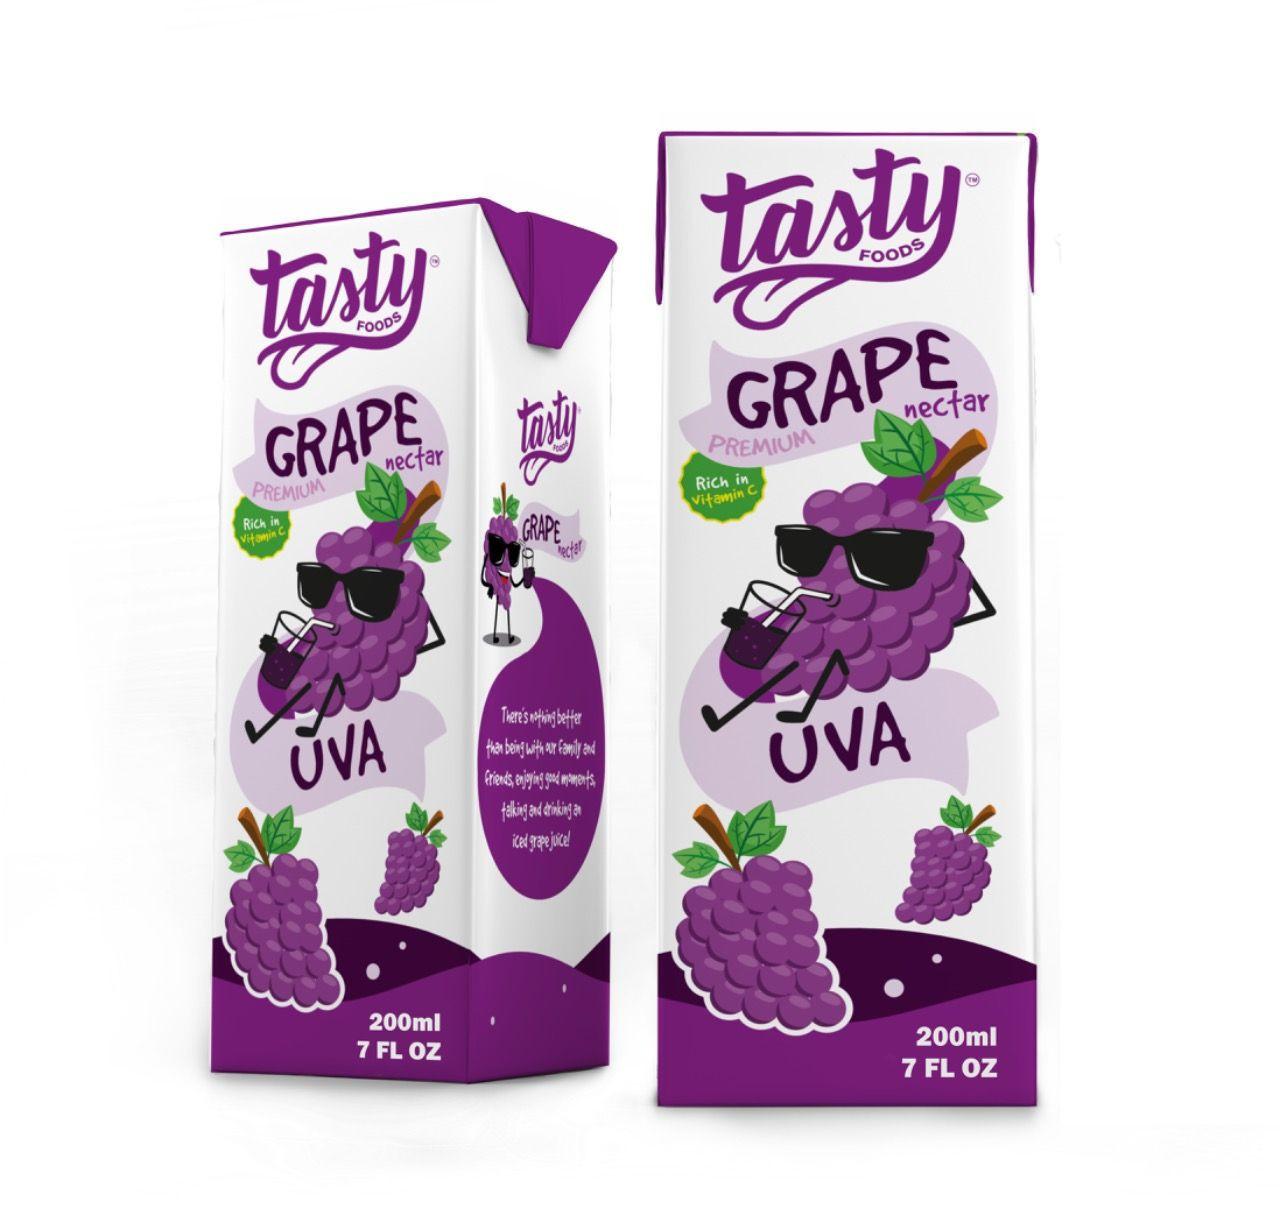 TASTY FOODS - GRAPE JUICE NECTAR PREMIUM - 200ML